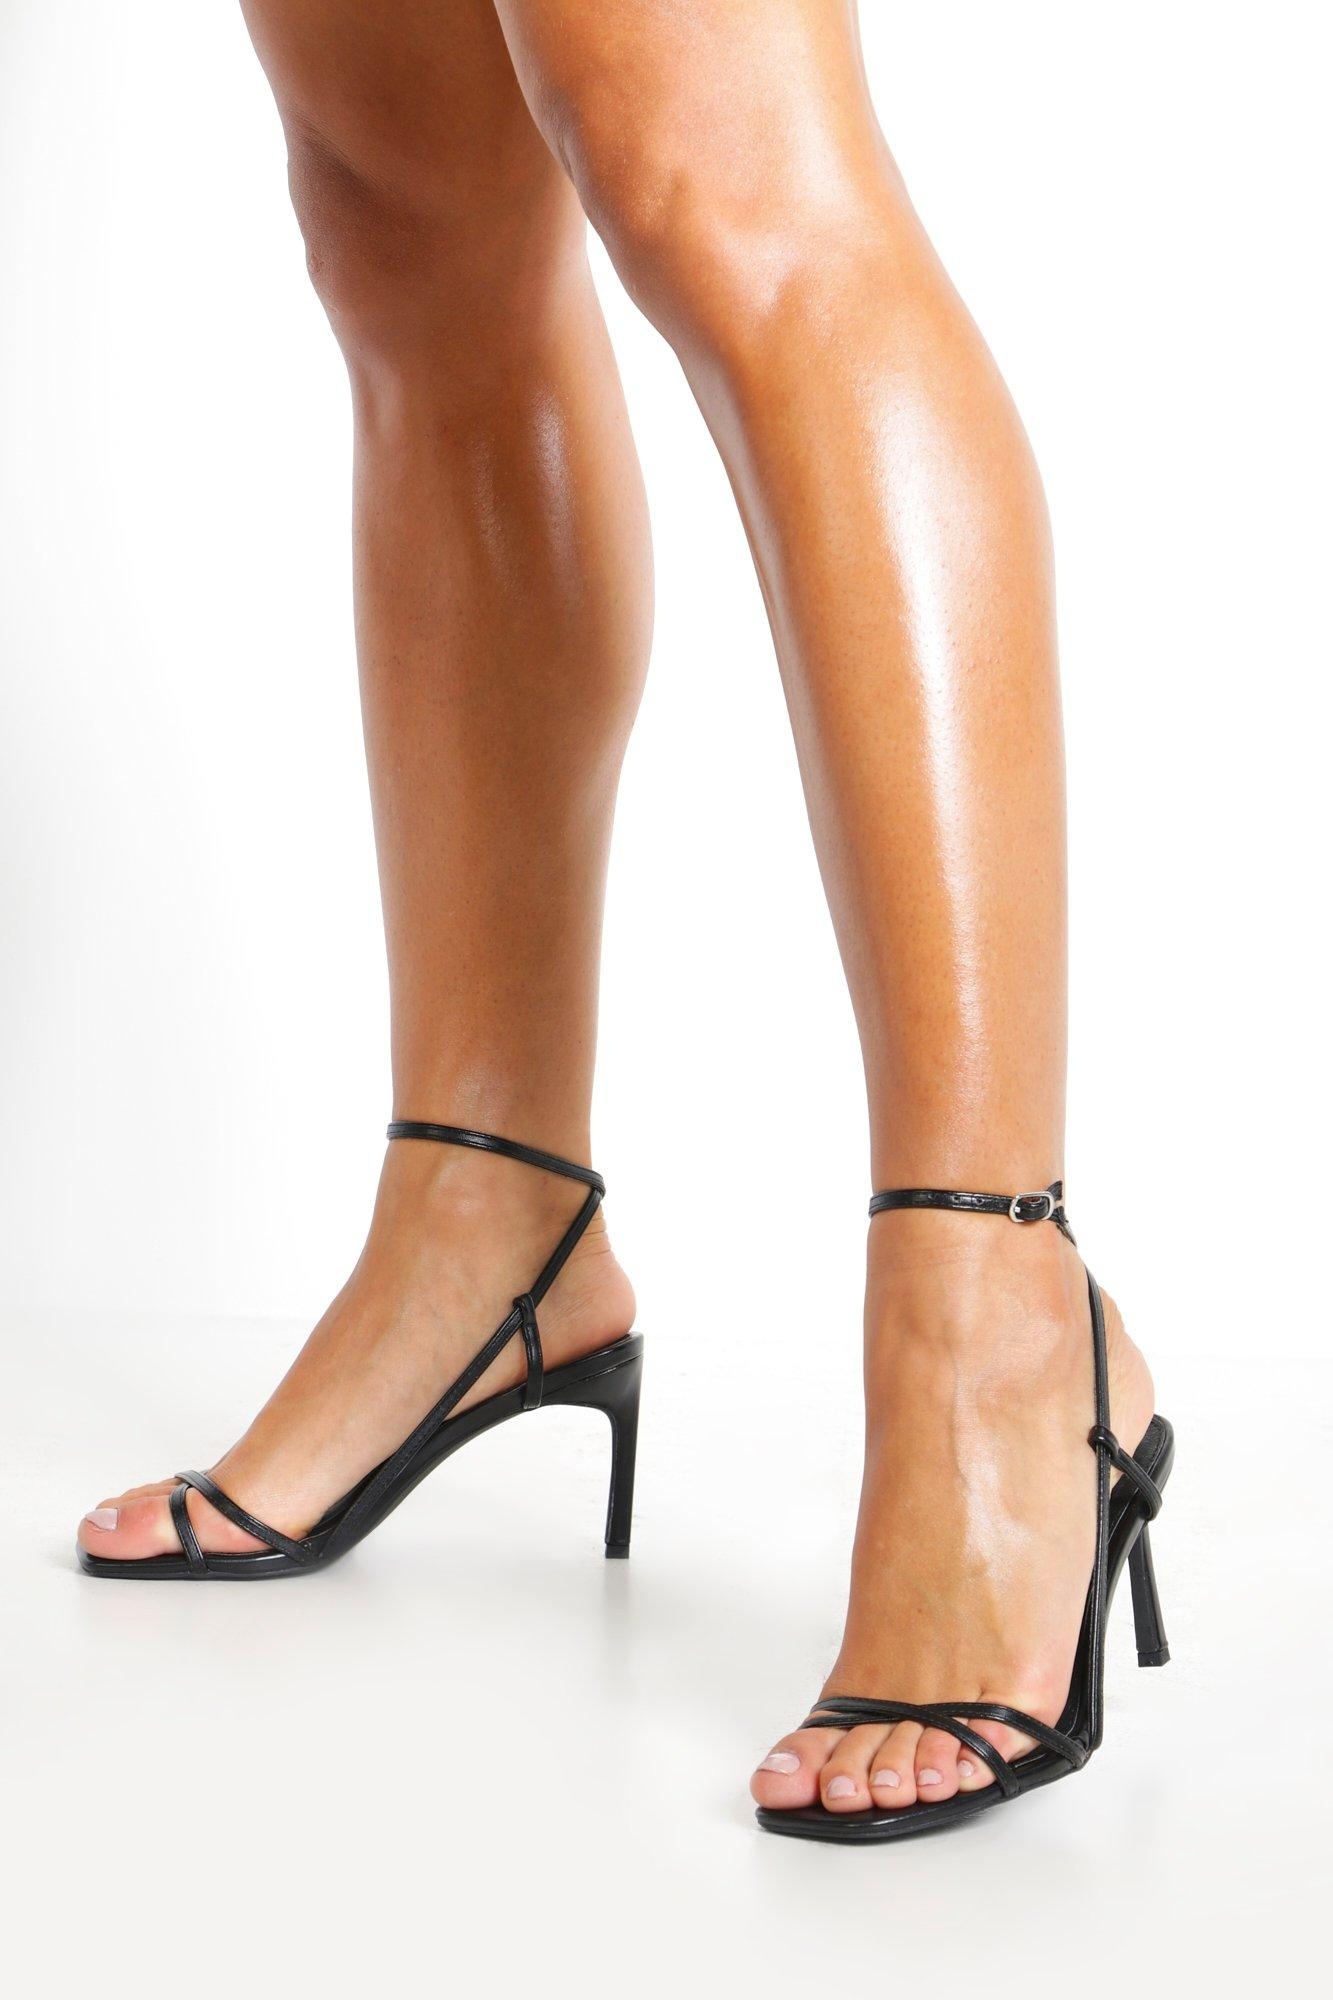 Black Strappy Sandals Heels